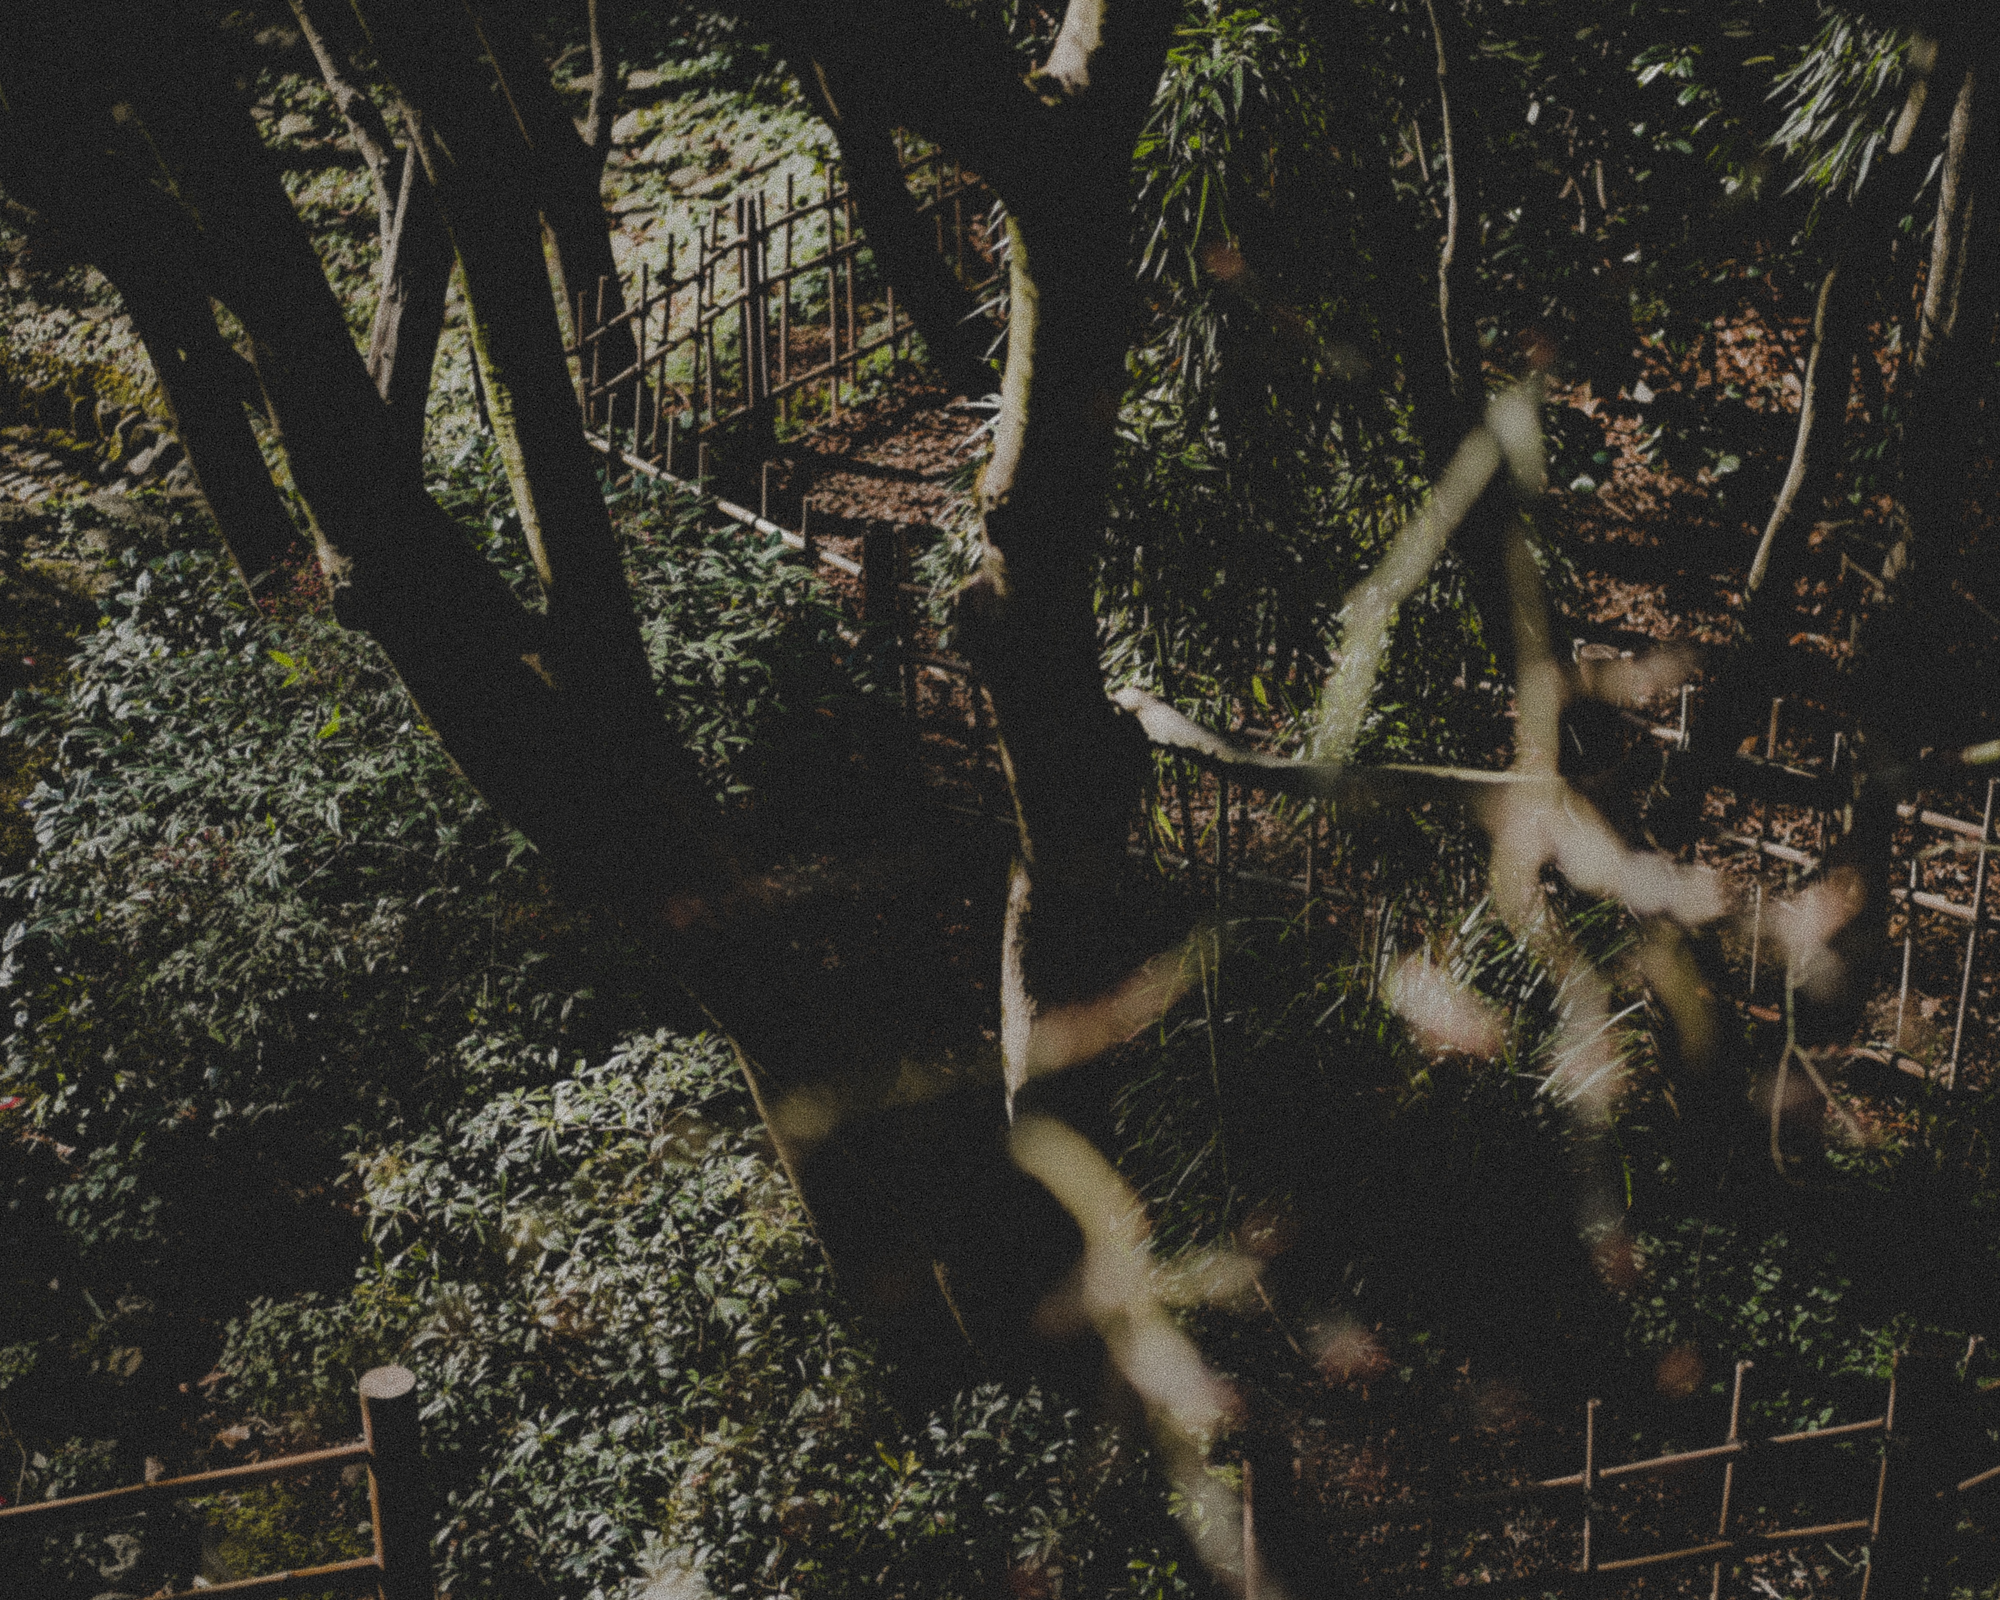 WA-Jardin-5216.jpg